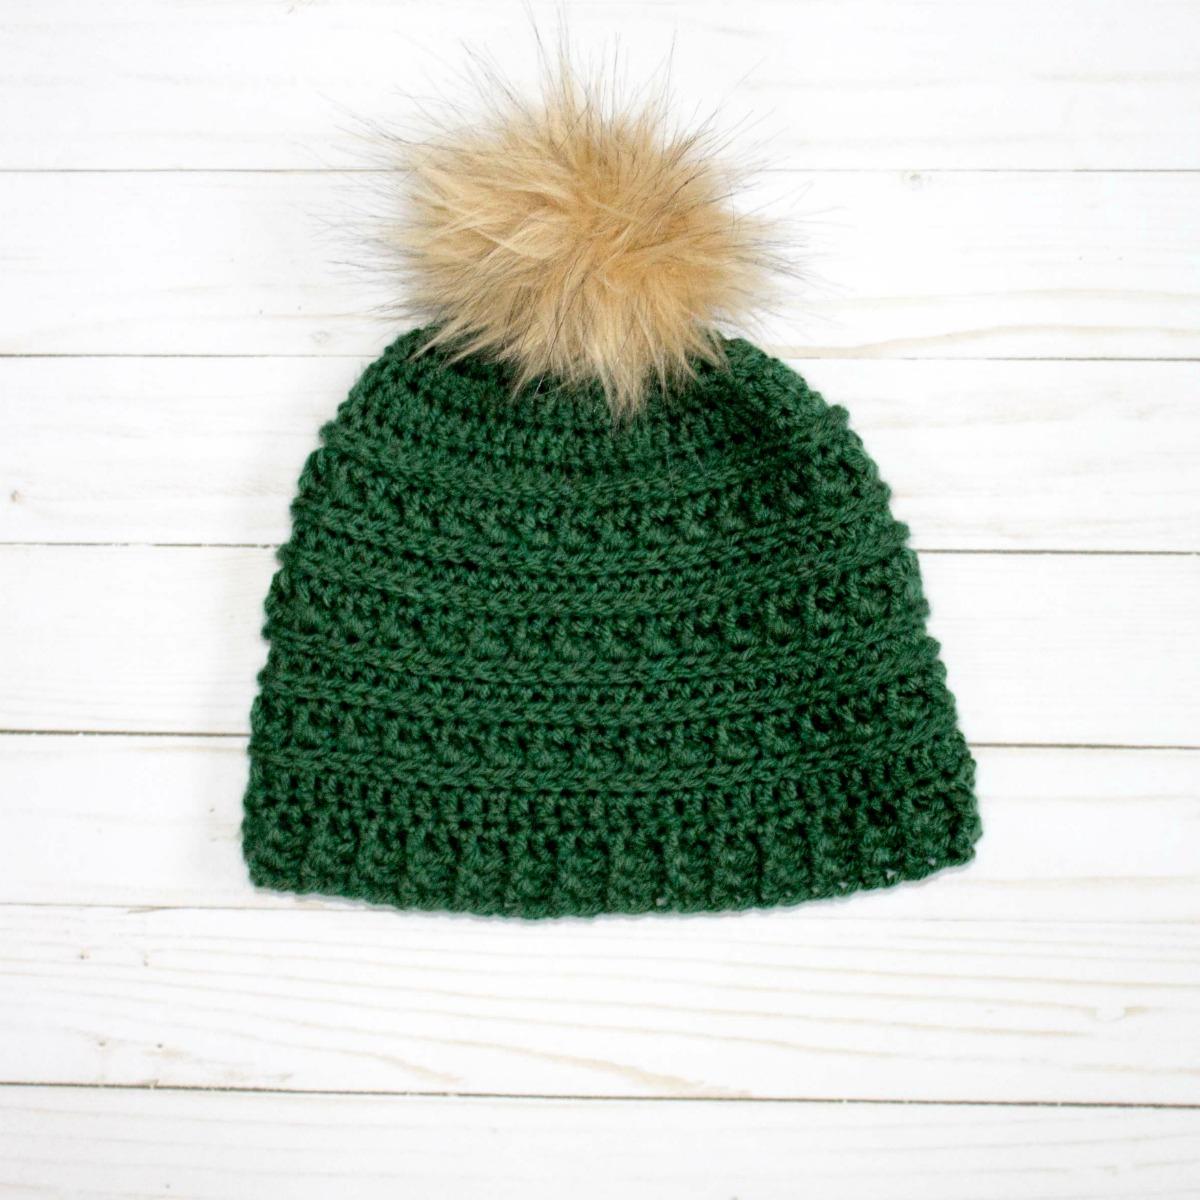 Crochet Hat Patterns Mountain Ridges Crochet Hat A Free Pattern Thefriendlyredfox